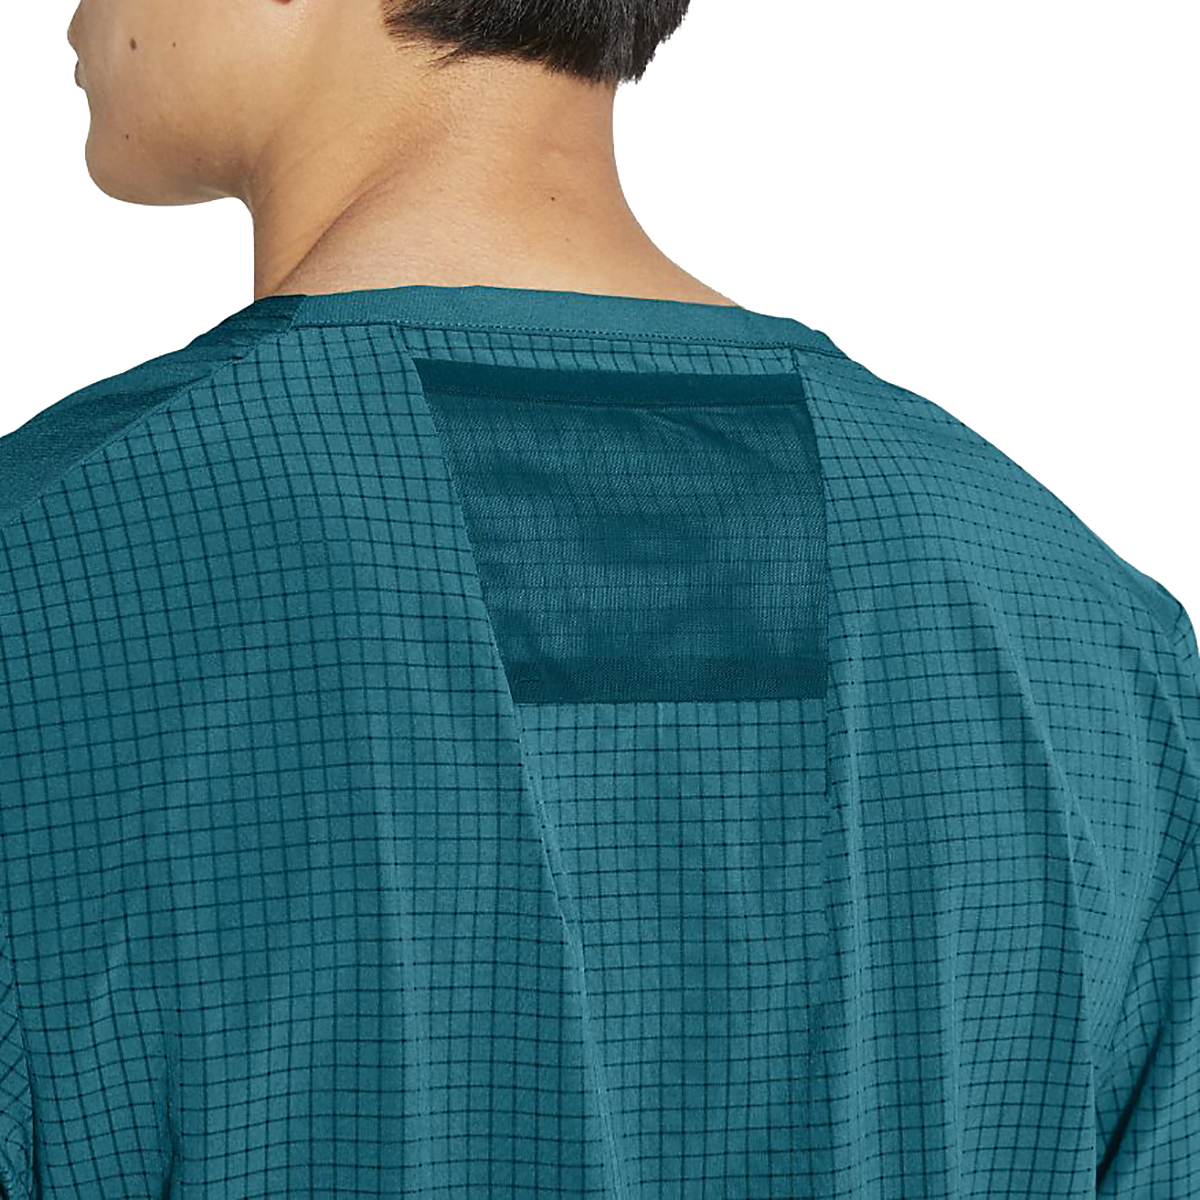 Men's Nike Dri-FIT Rise 365 Short-Sleeve Trail Running Top, , large, image 3